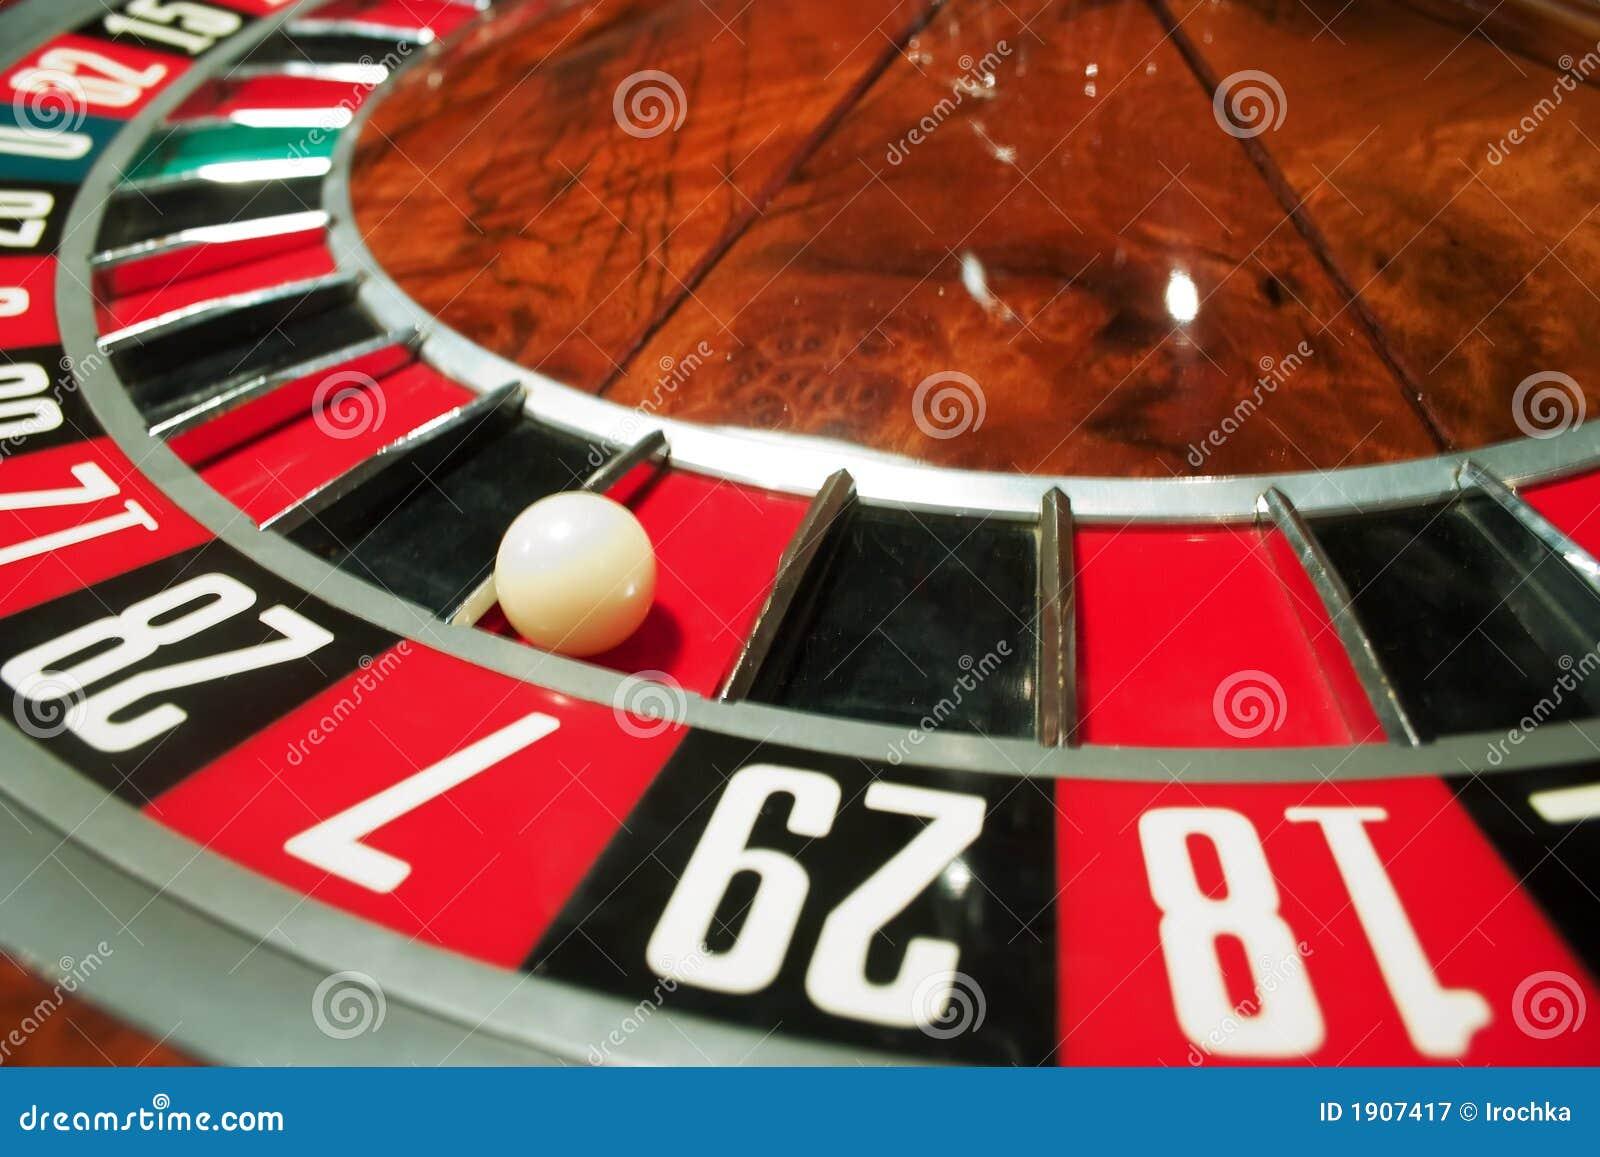 Double ball roulette simulator